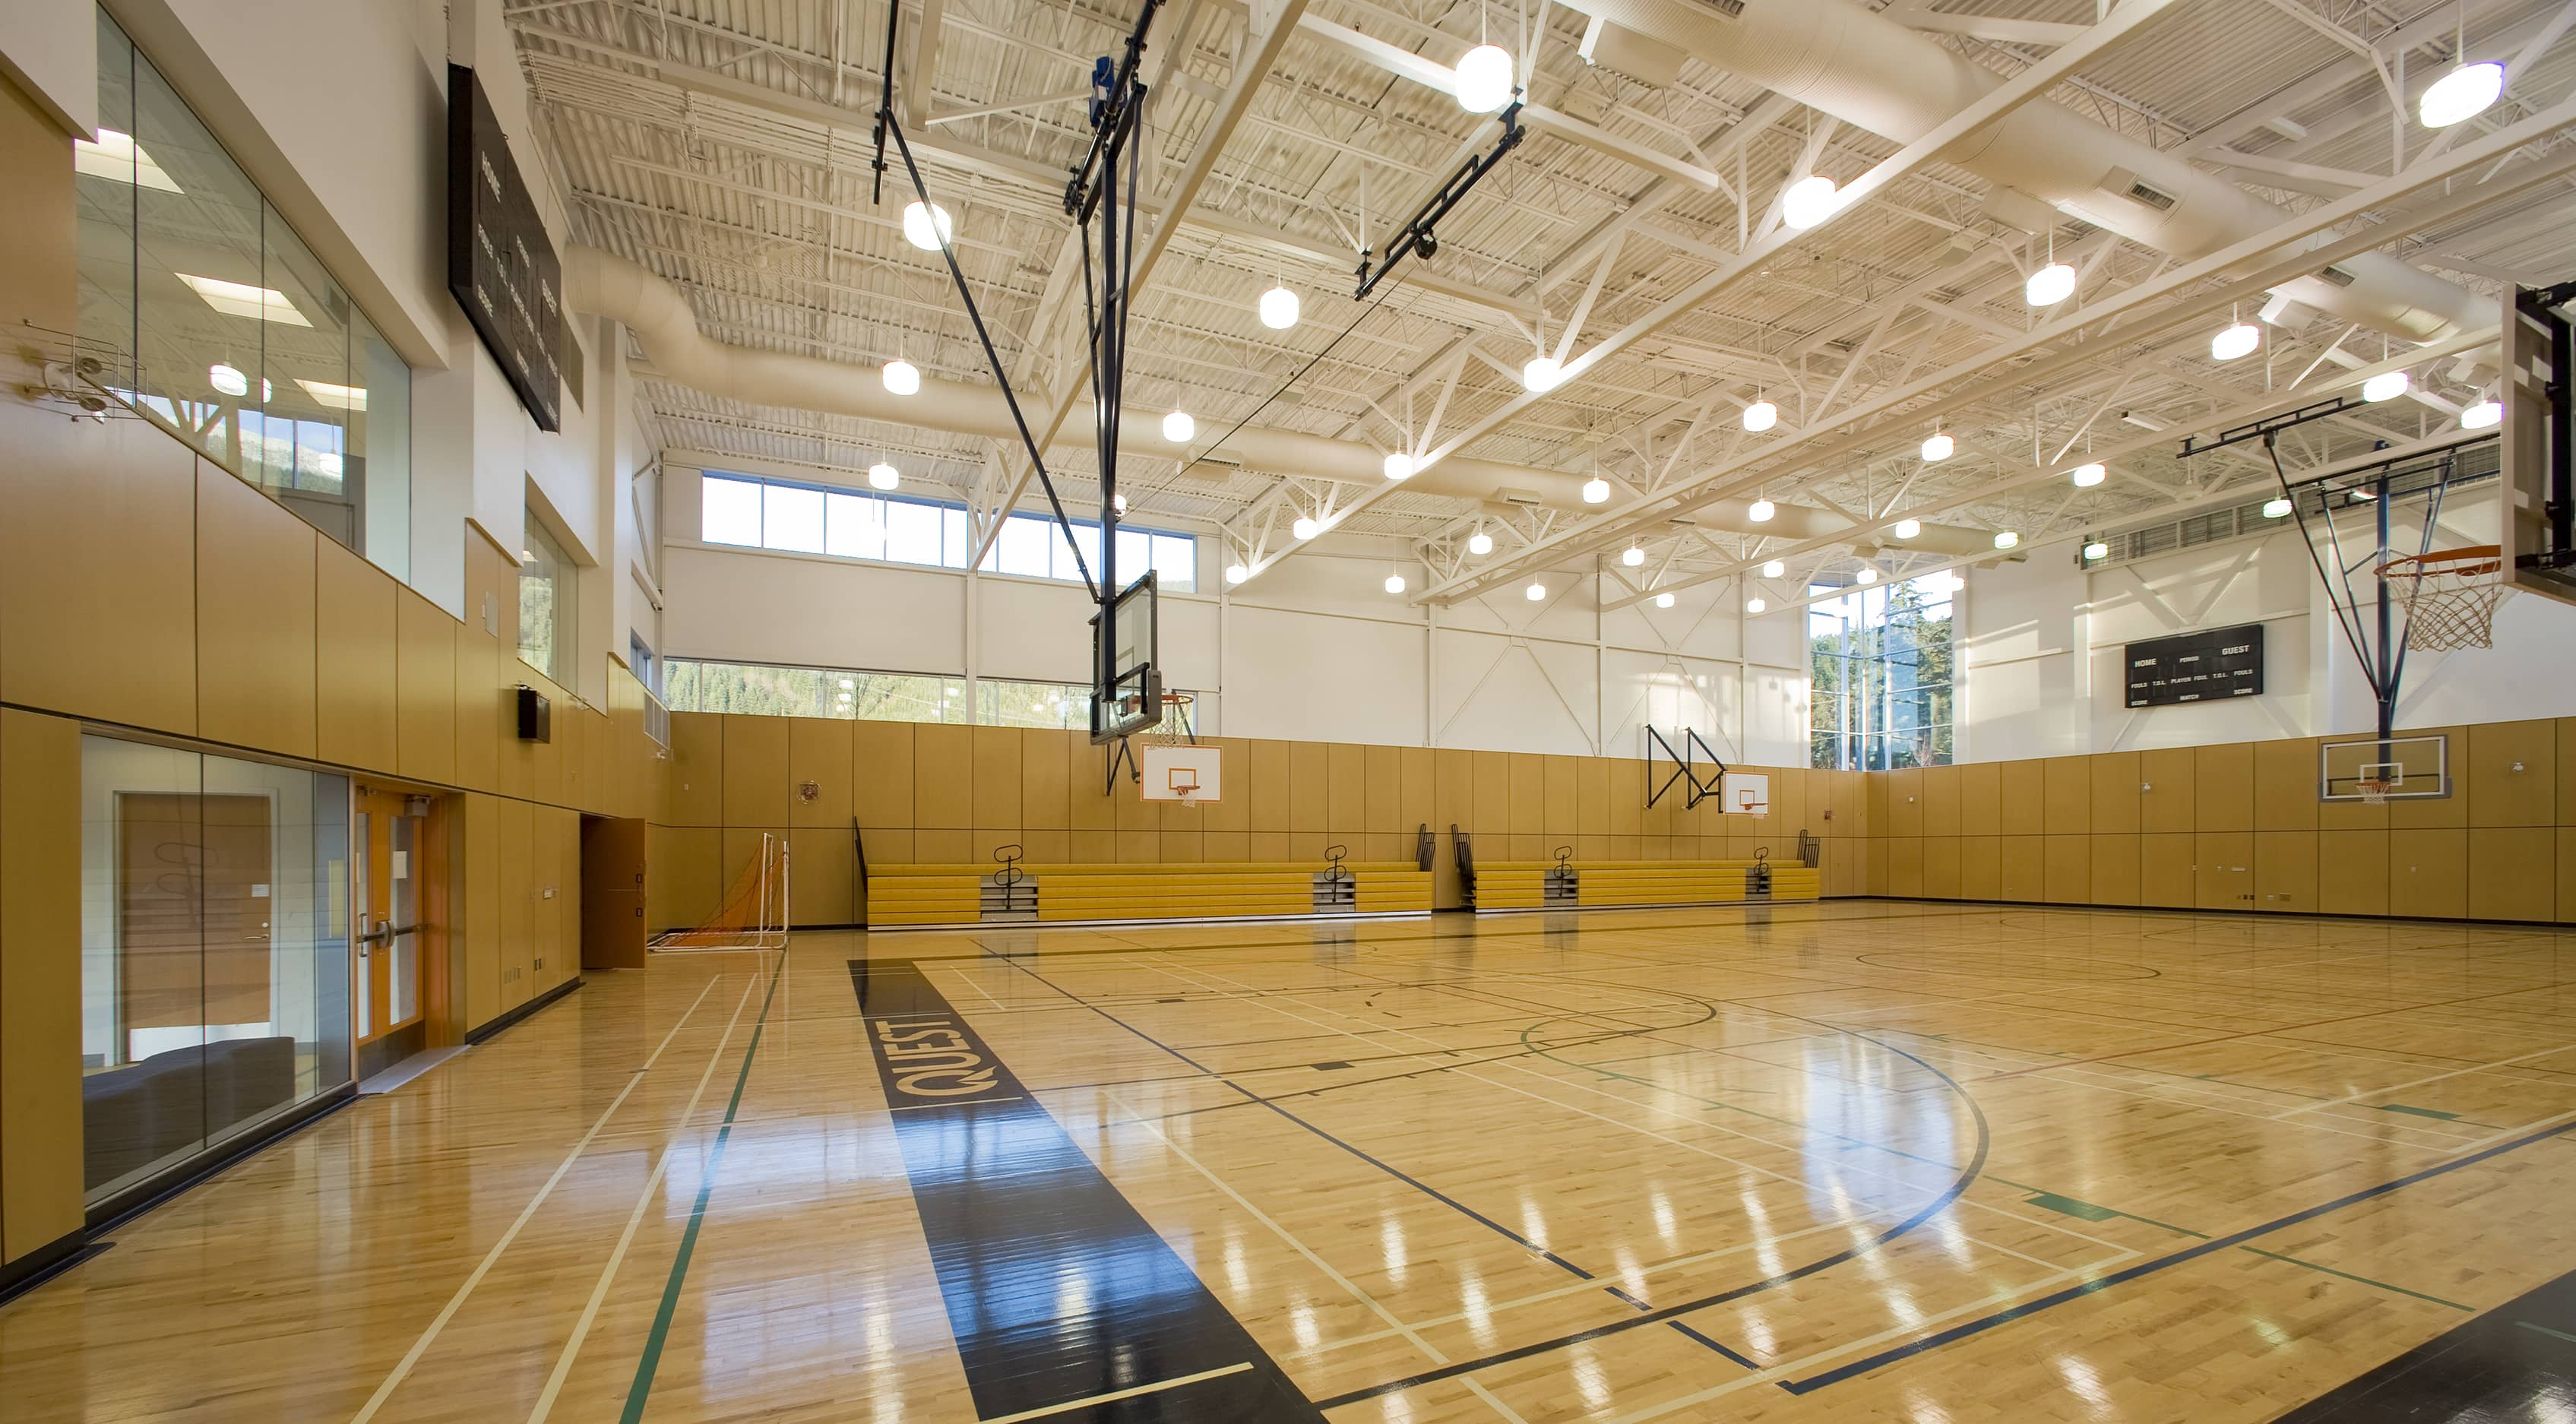 bbp quest university gymnasium